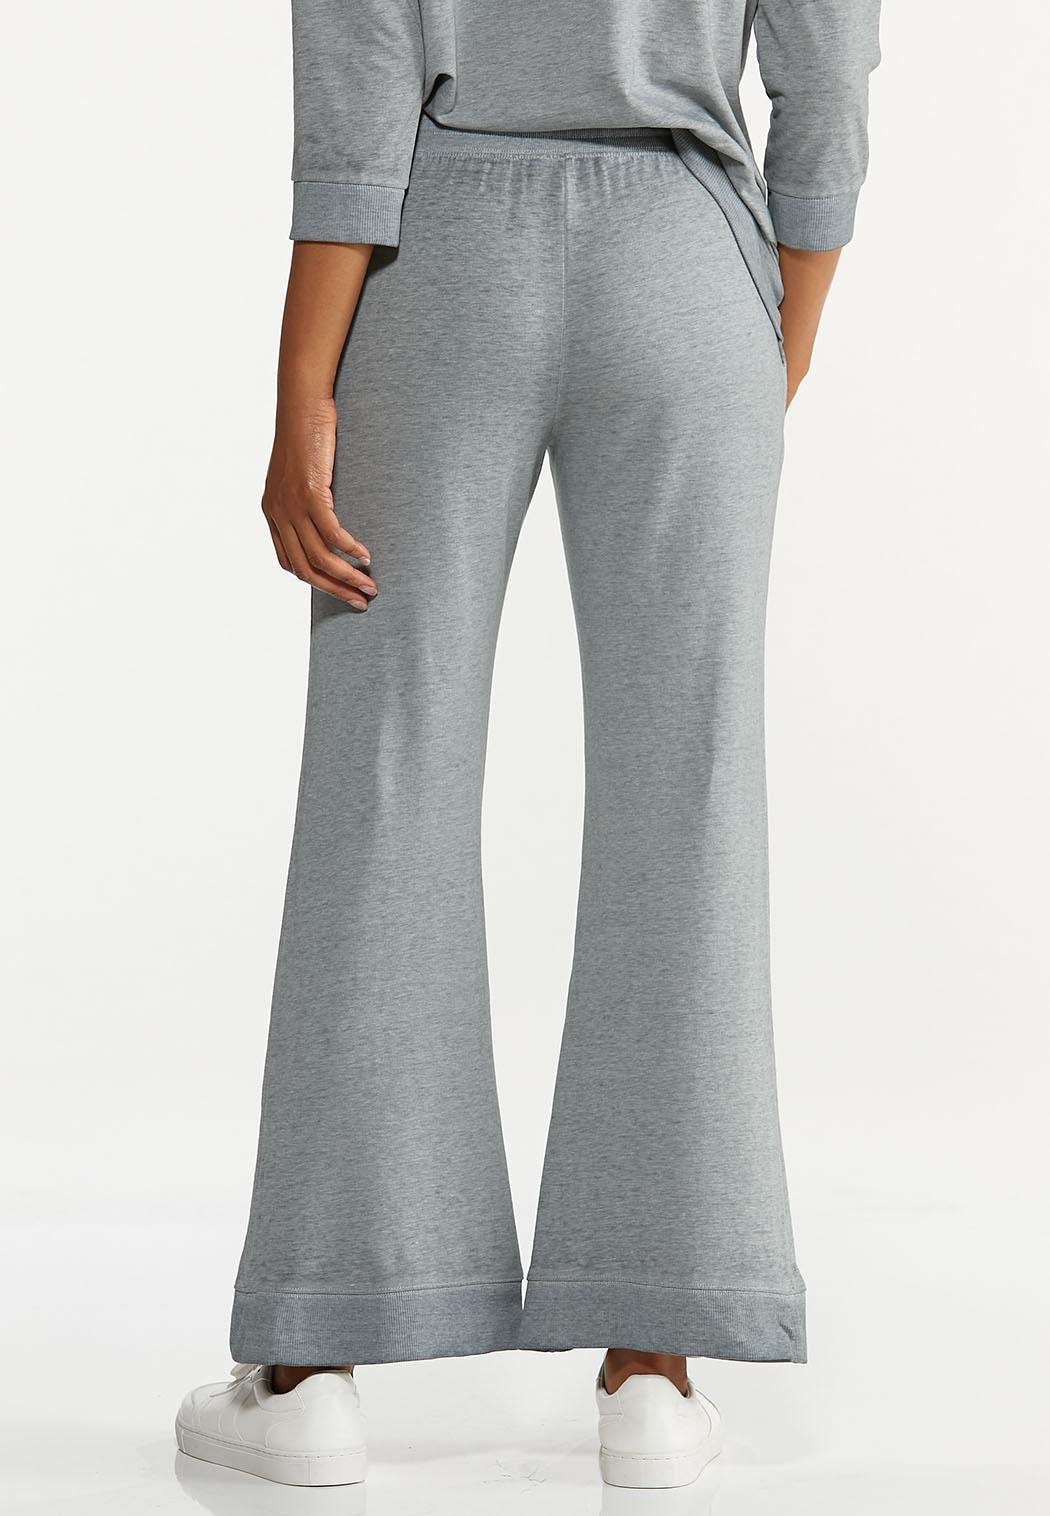 Gray Flare Lounge Pants (Item #44615764)